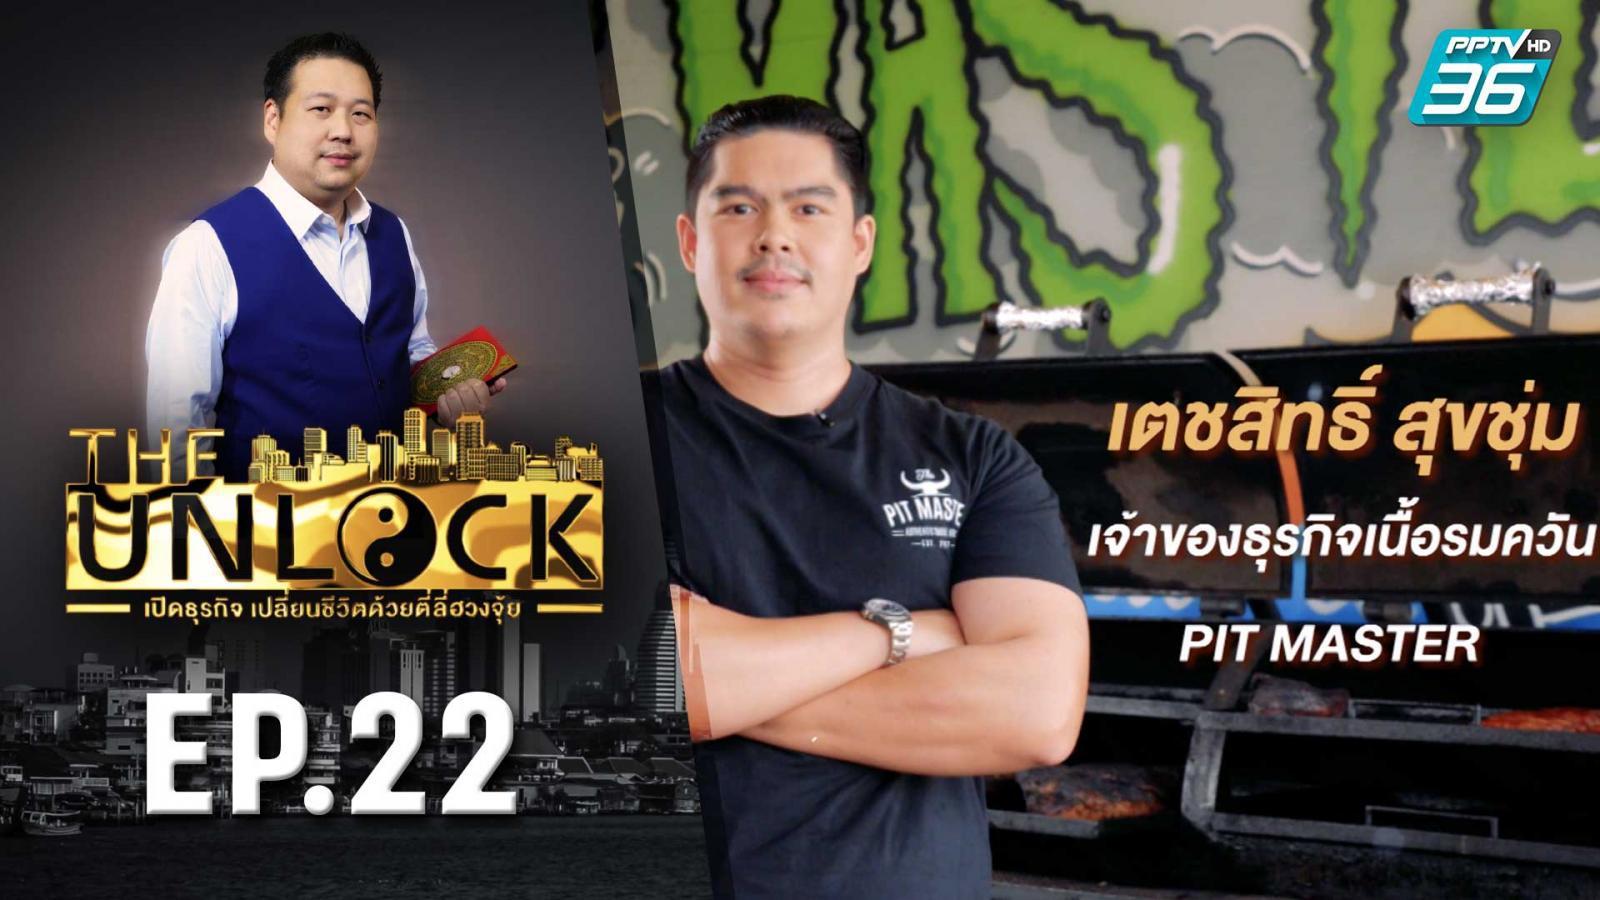 The Unlock เปิดธุรกิจ เปลี่ยนชีวิตด้วยตี่ลี่ฮวงจุ้ย | The Pit Master EP.22 | PPTVHD 36